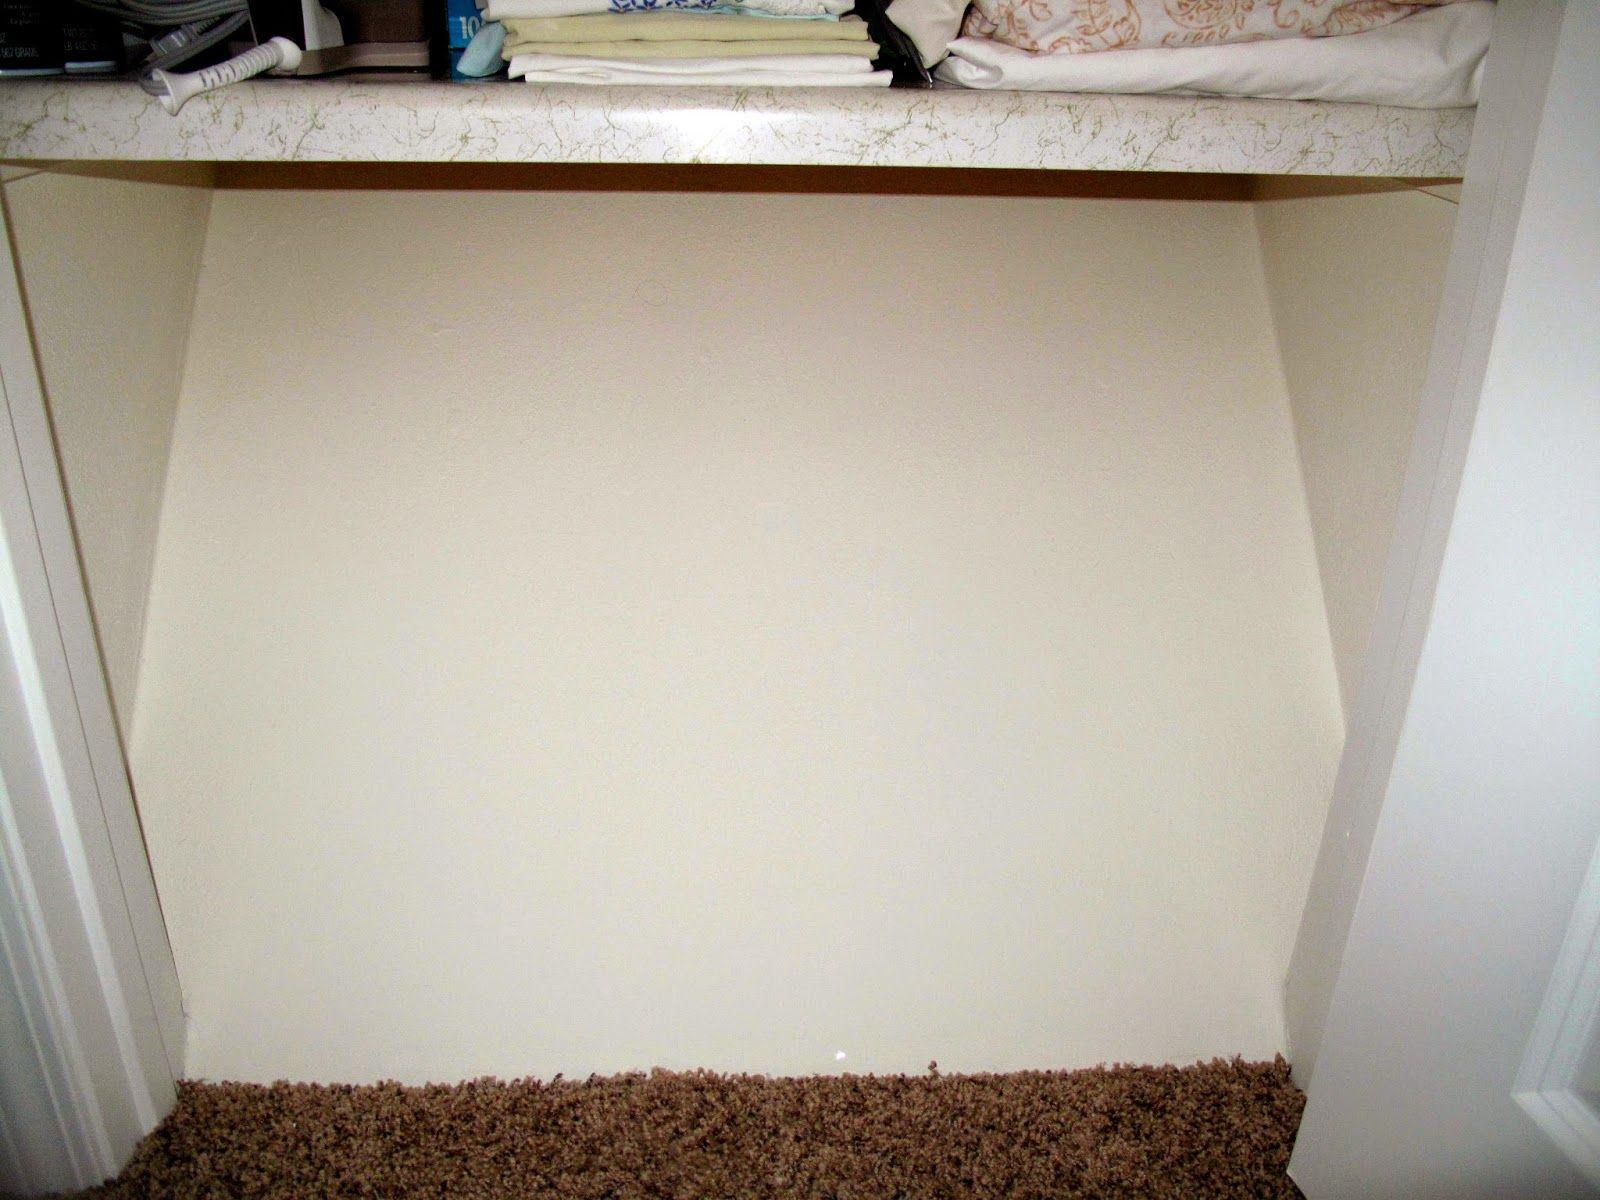 Cheerful Thrifty Door Slanted Closet Floor Problem Sloved Flooring Diy Closet Kitchen Cupboard Organization